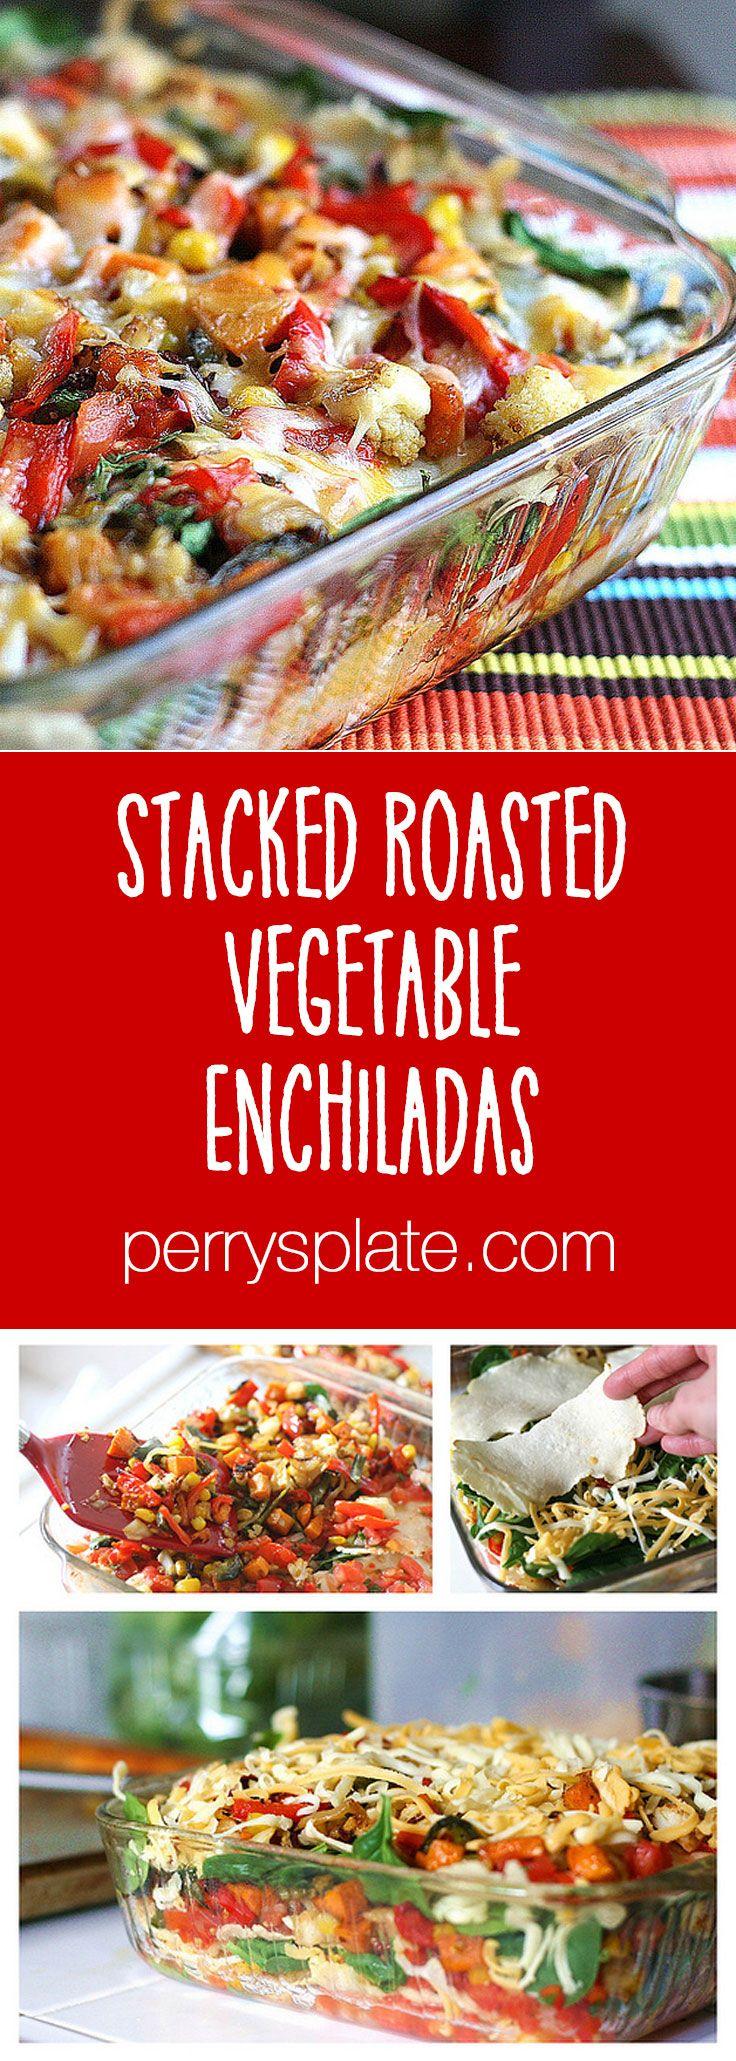 Stacked Roasted Vegetable Enchiladas | enchilada recipes | gluten-free recipes | roasted vegetable recipes | perrysplate.com